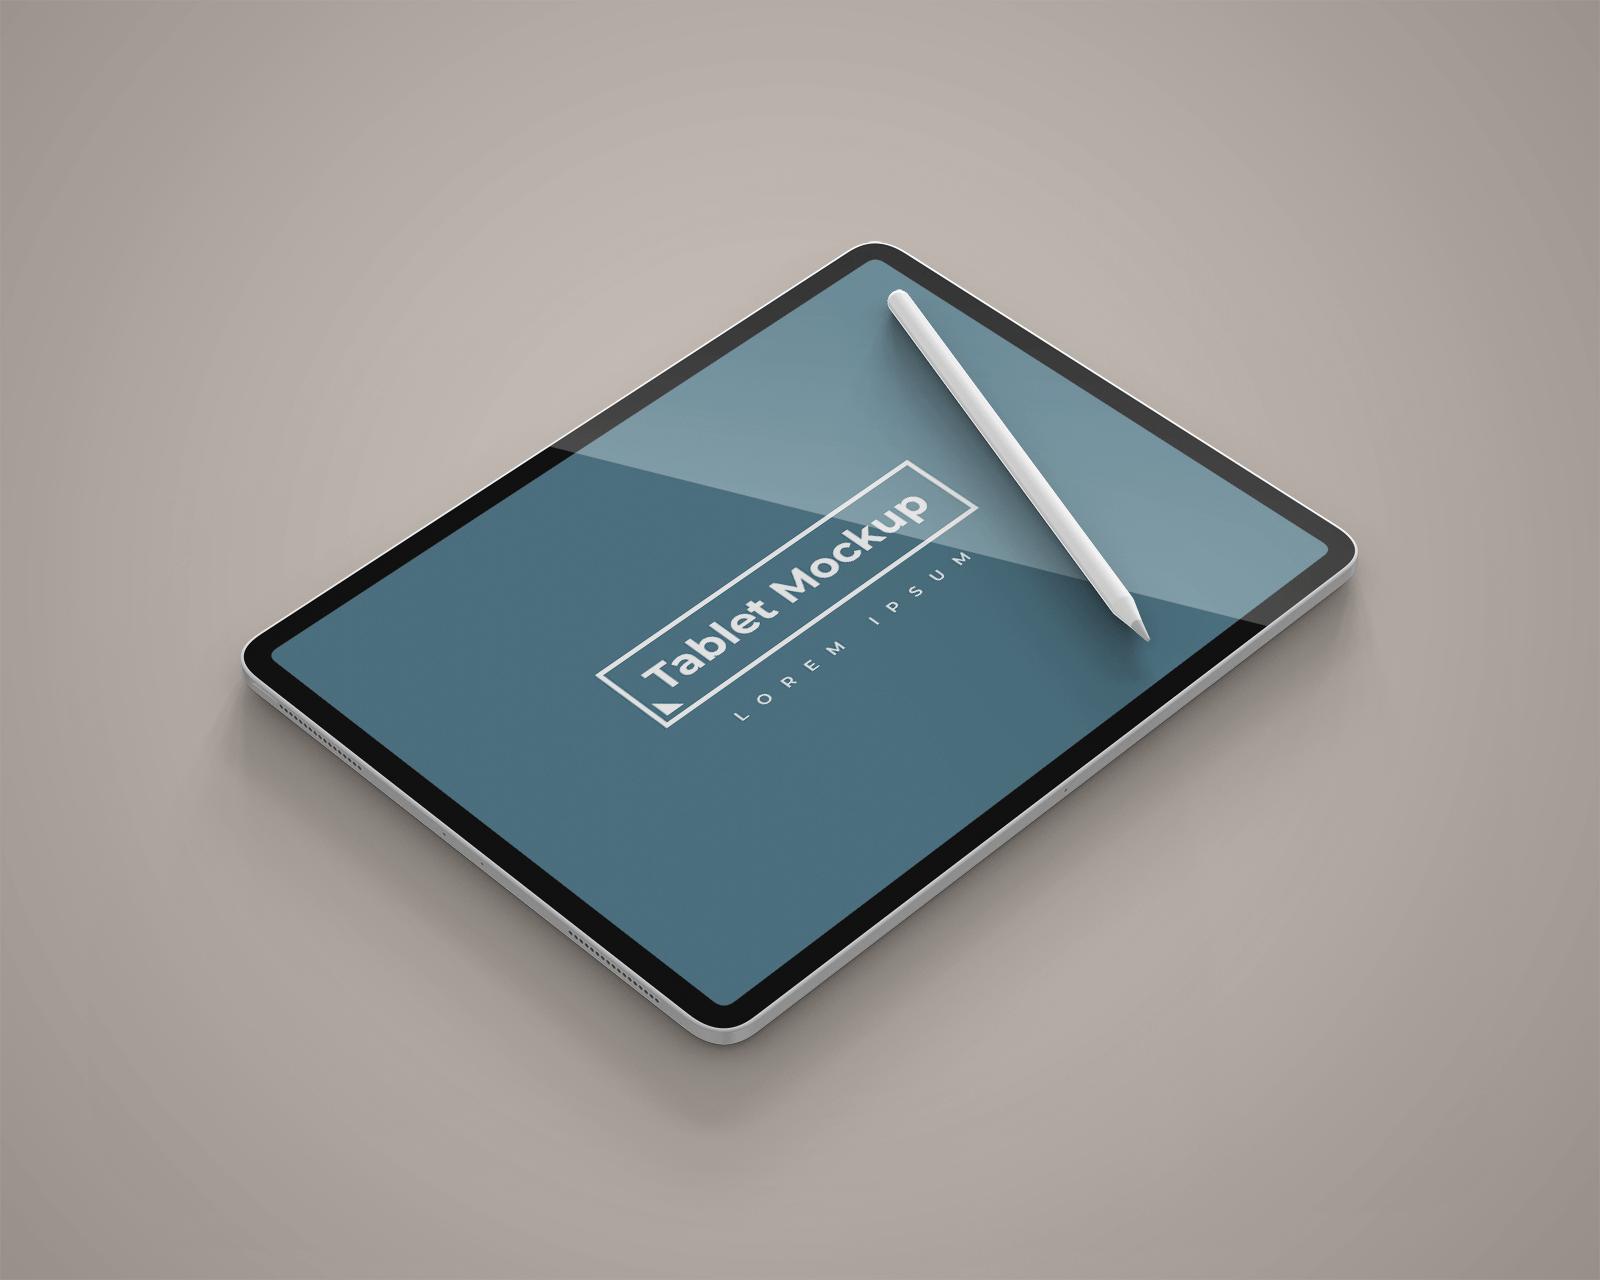 Free iPad Pro with Stylus Mockup